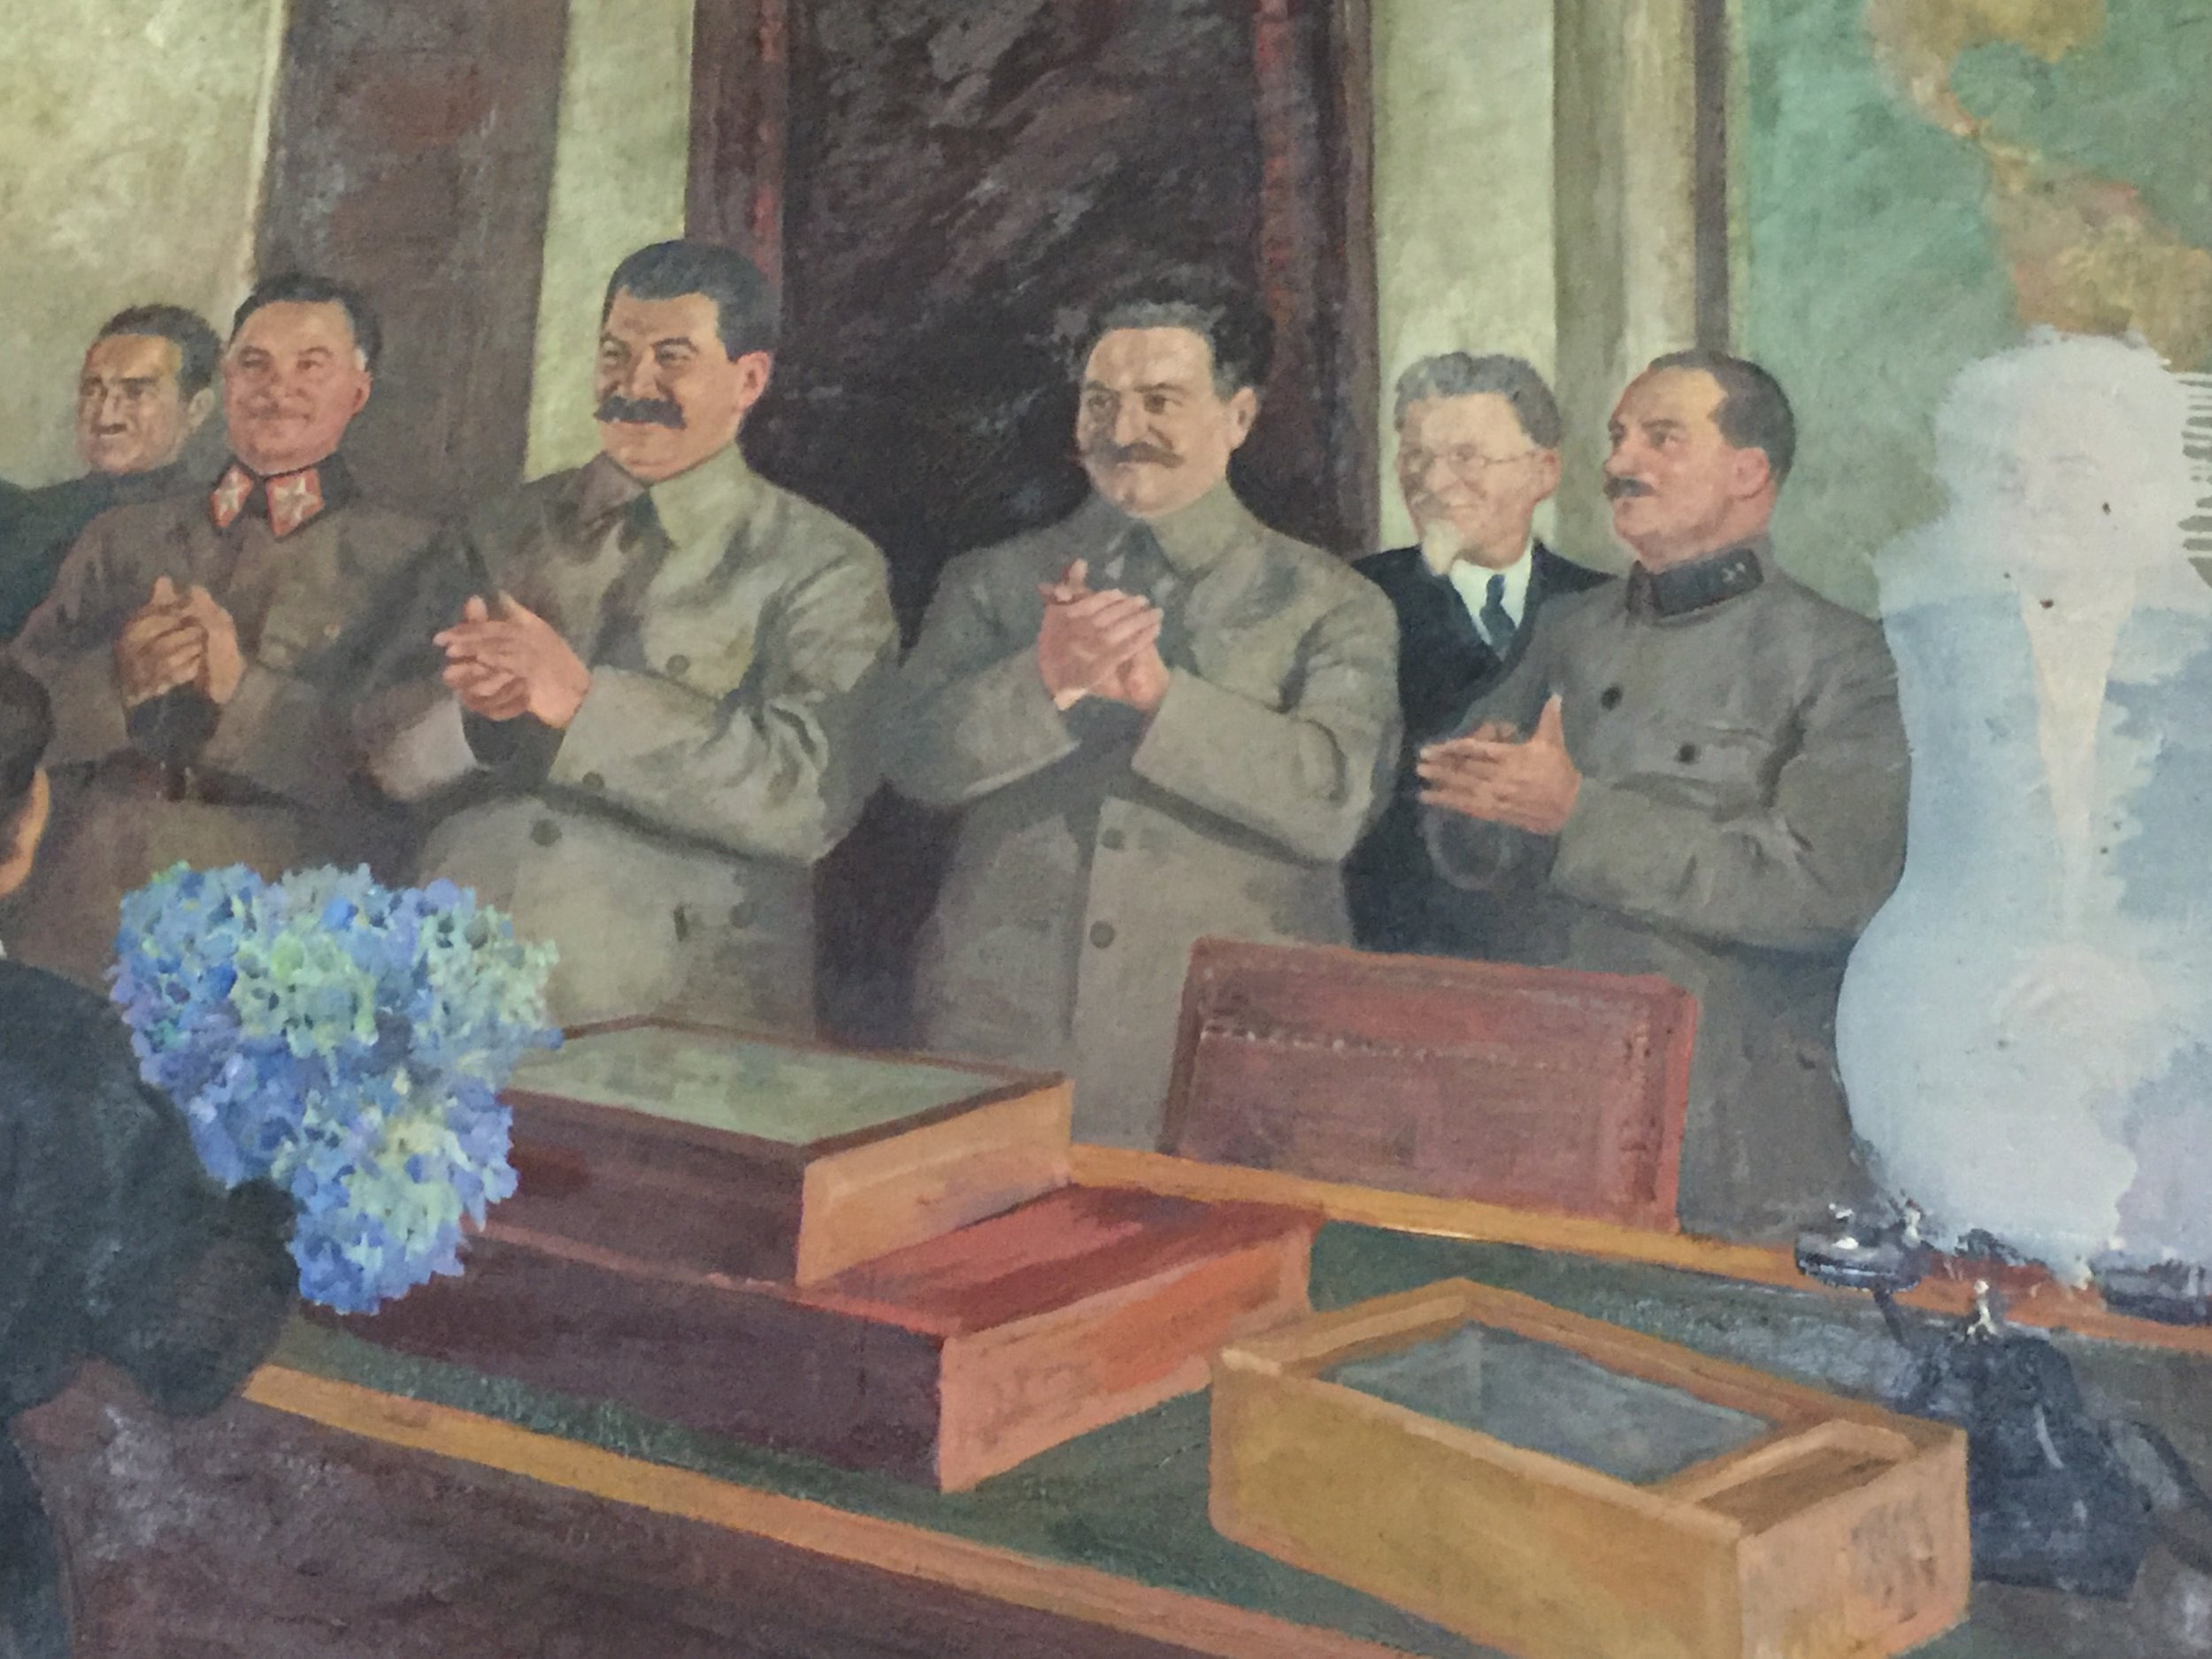 Courtesy of the Stalin Museum in Gori, Georgia